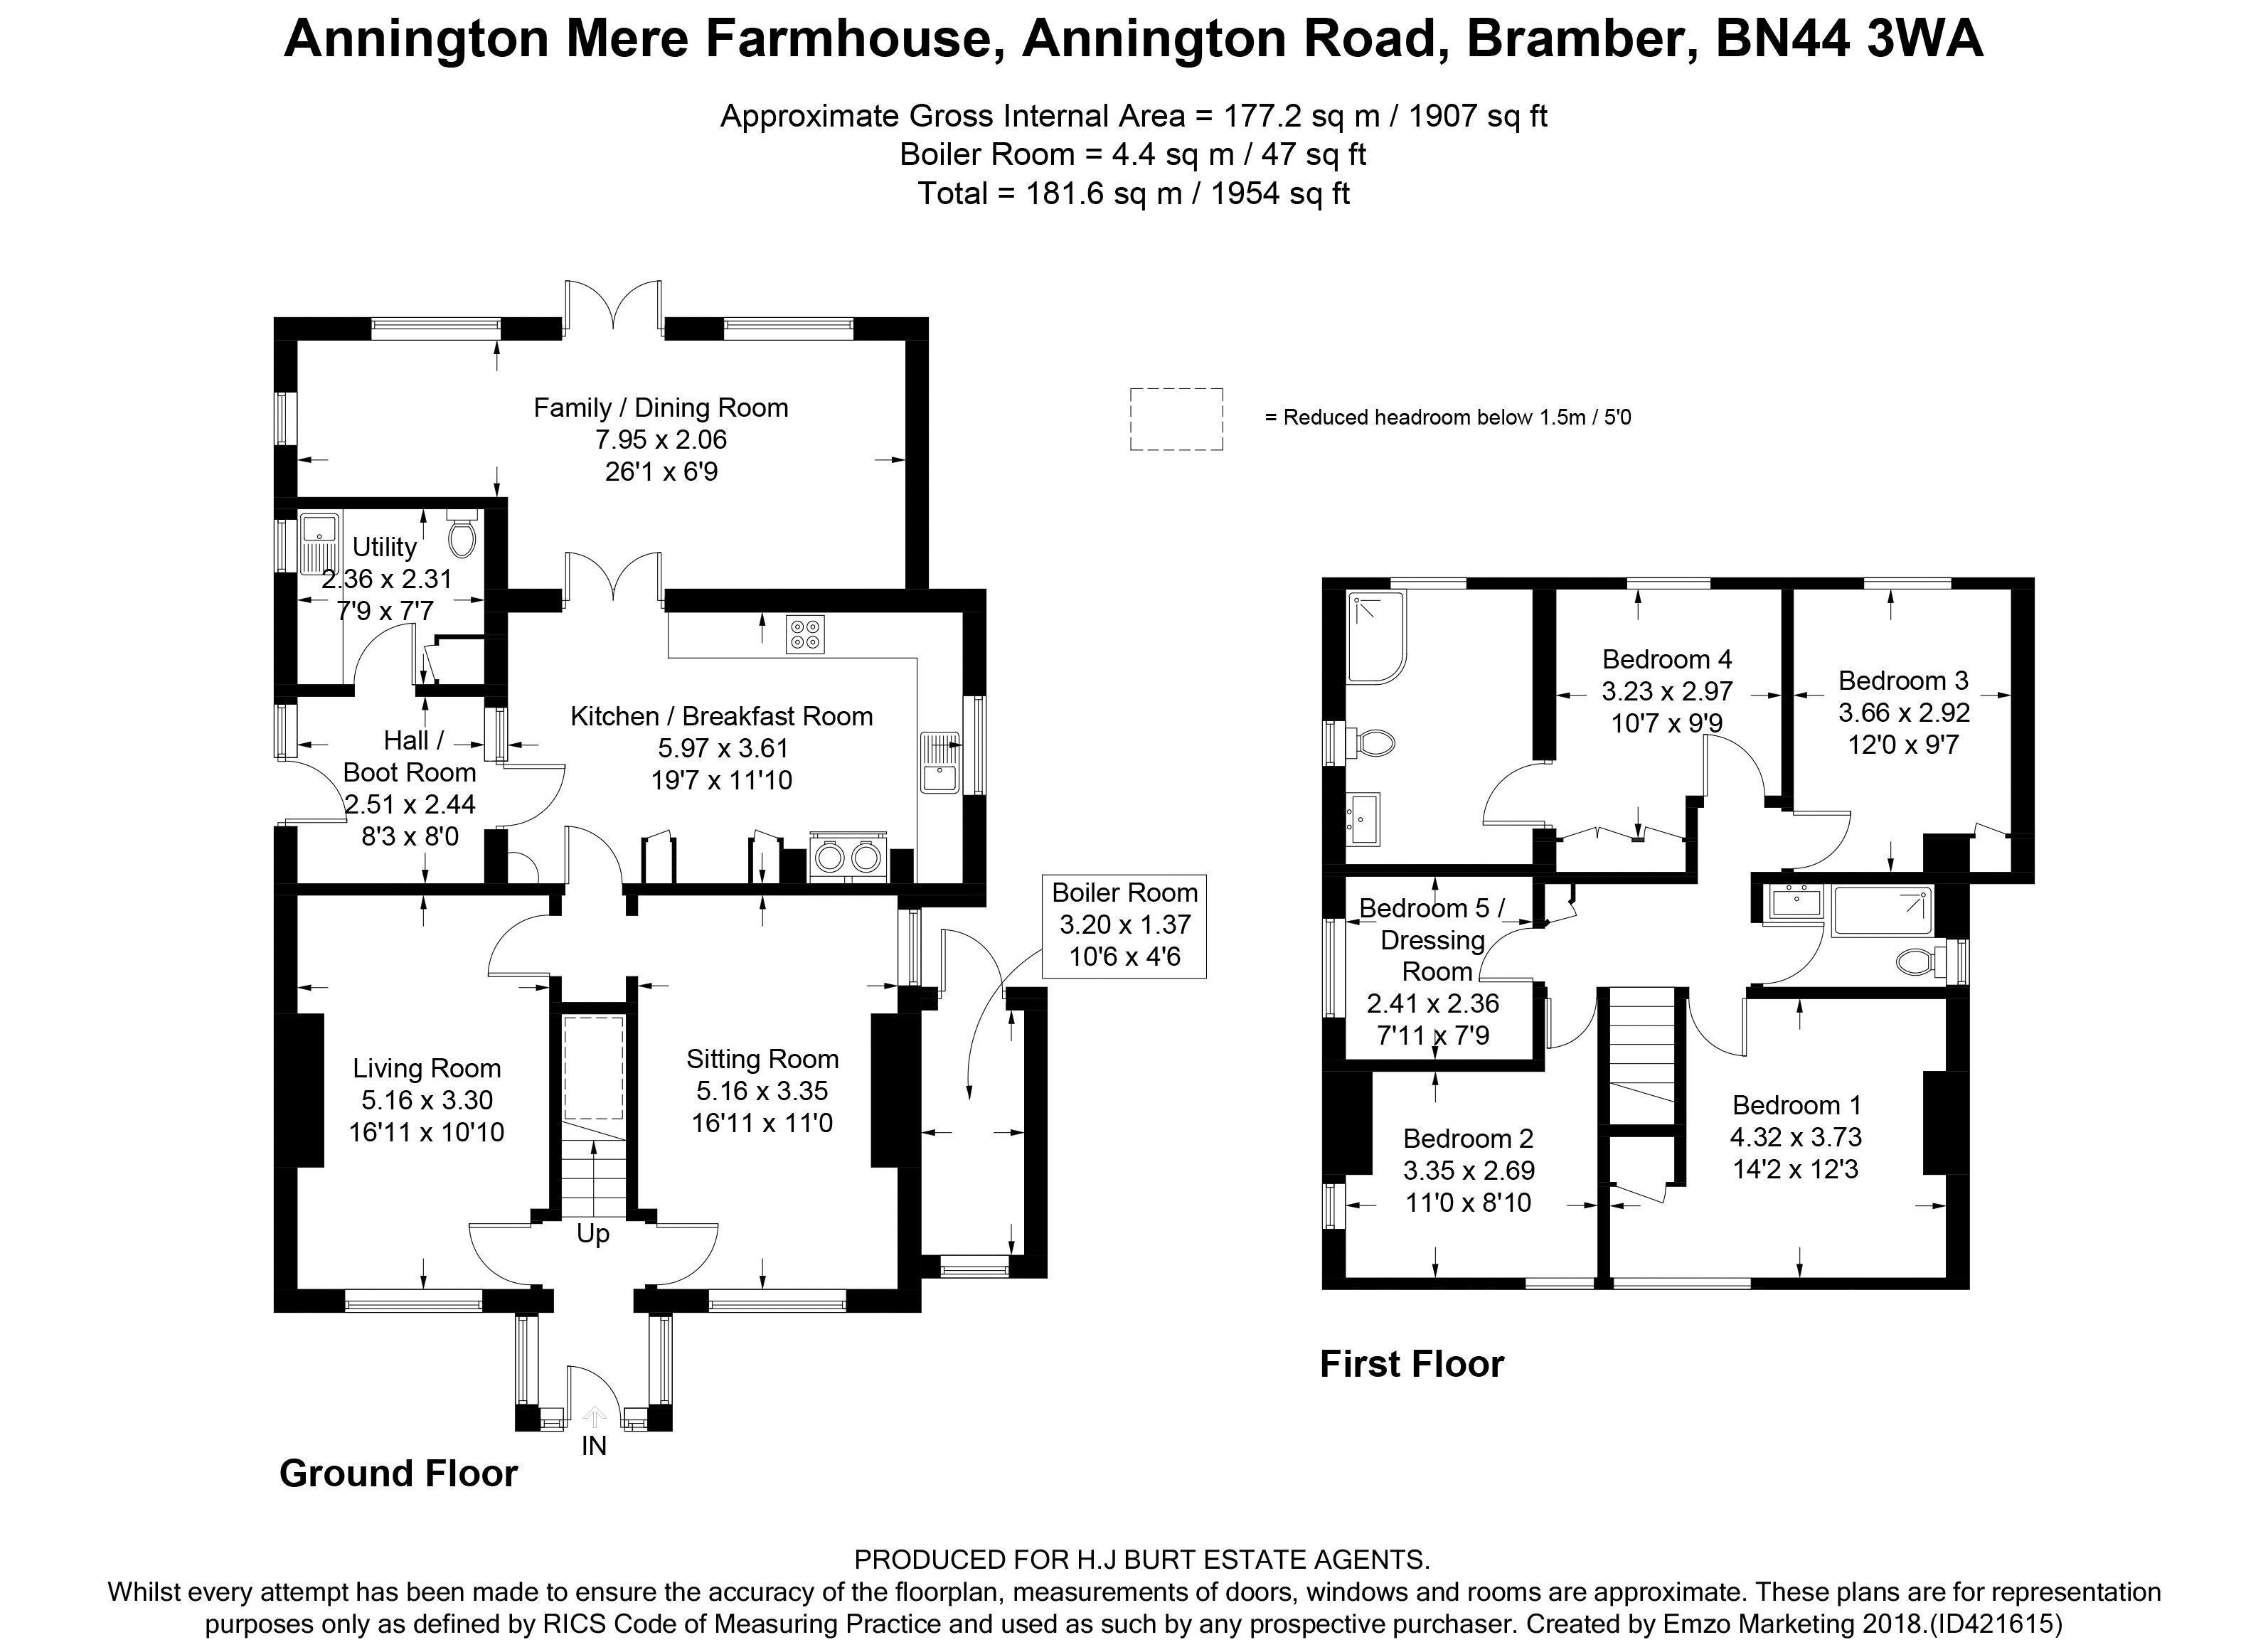 Annington Road